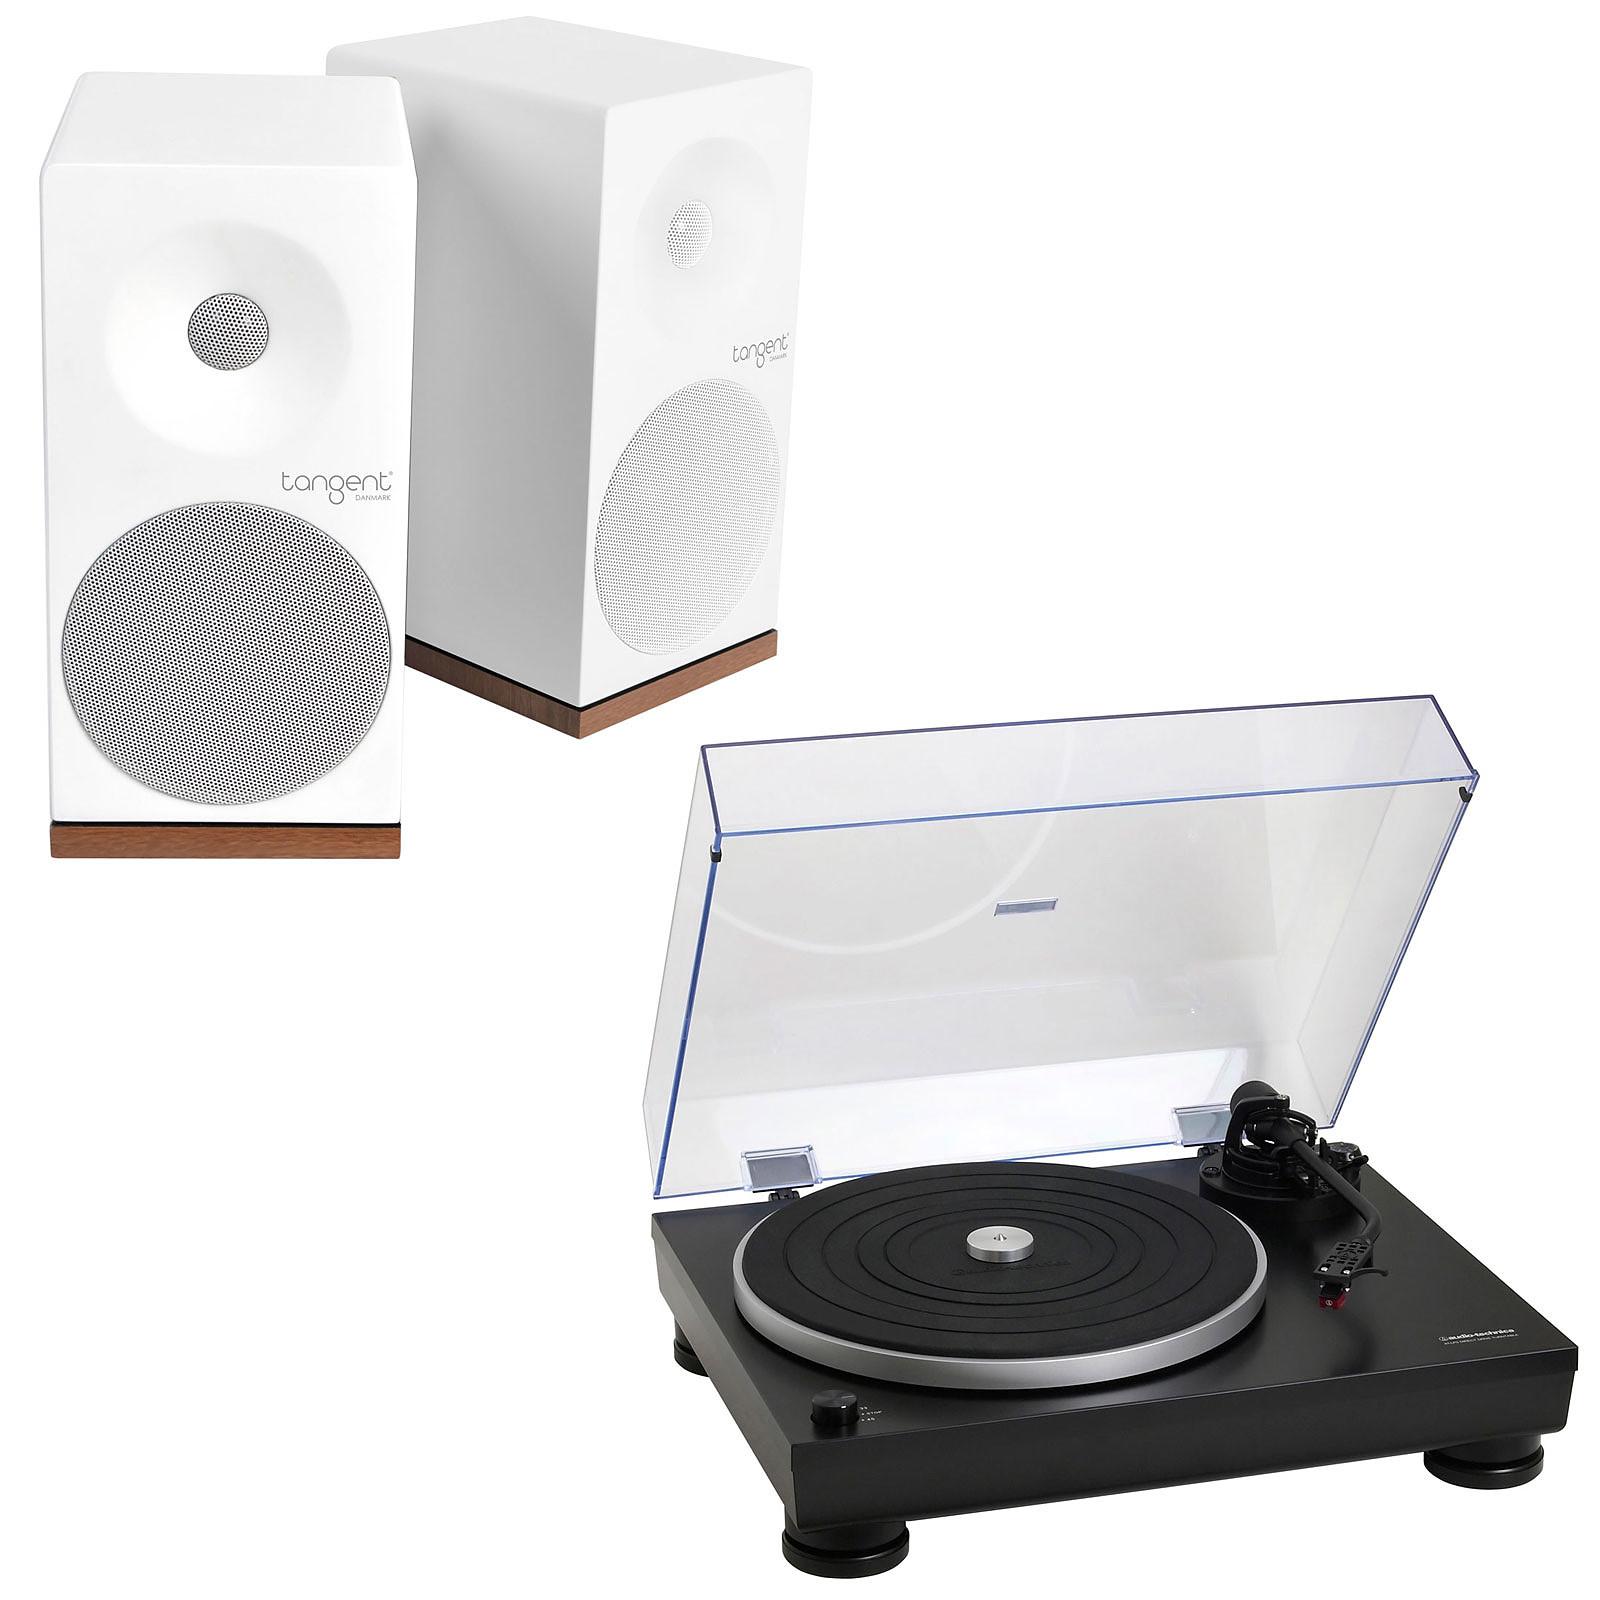 Audio-Technica AT-LP5 Noir + Tangent Spectrum X5 BT Phono Blanc